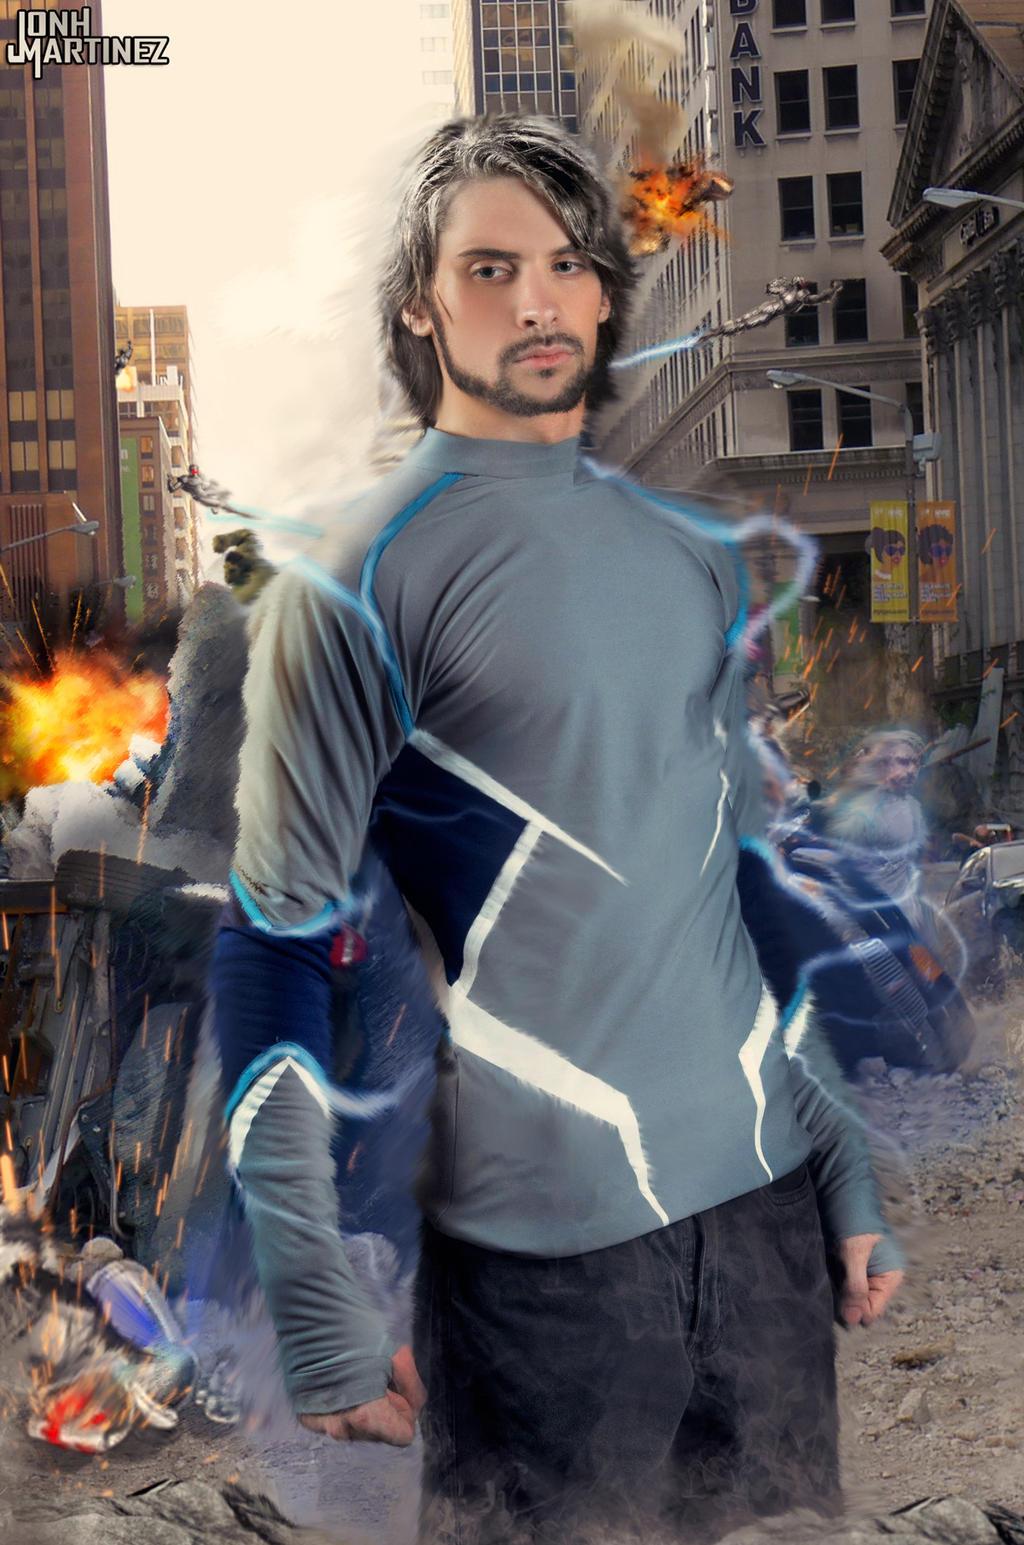 2019 year look- Avengers Quicksilver 2 costume